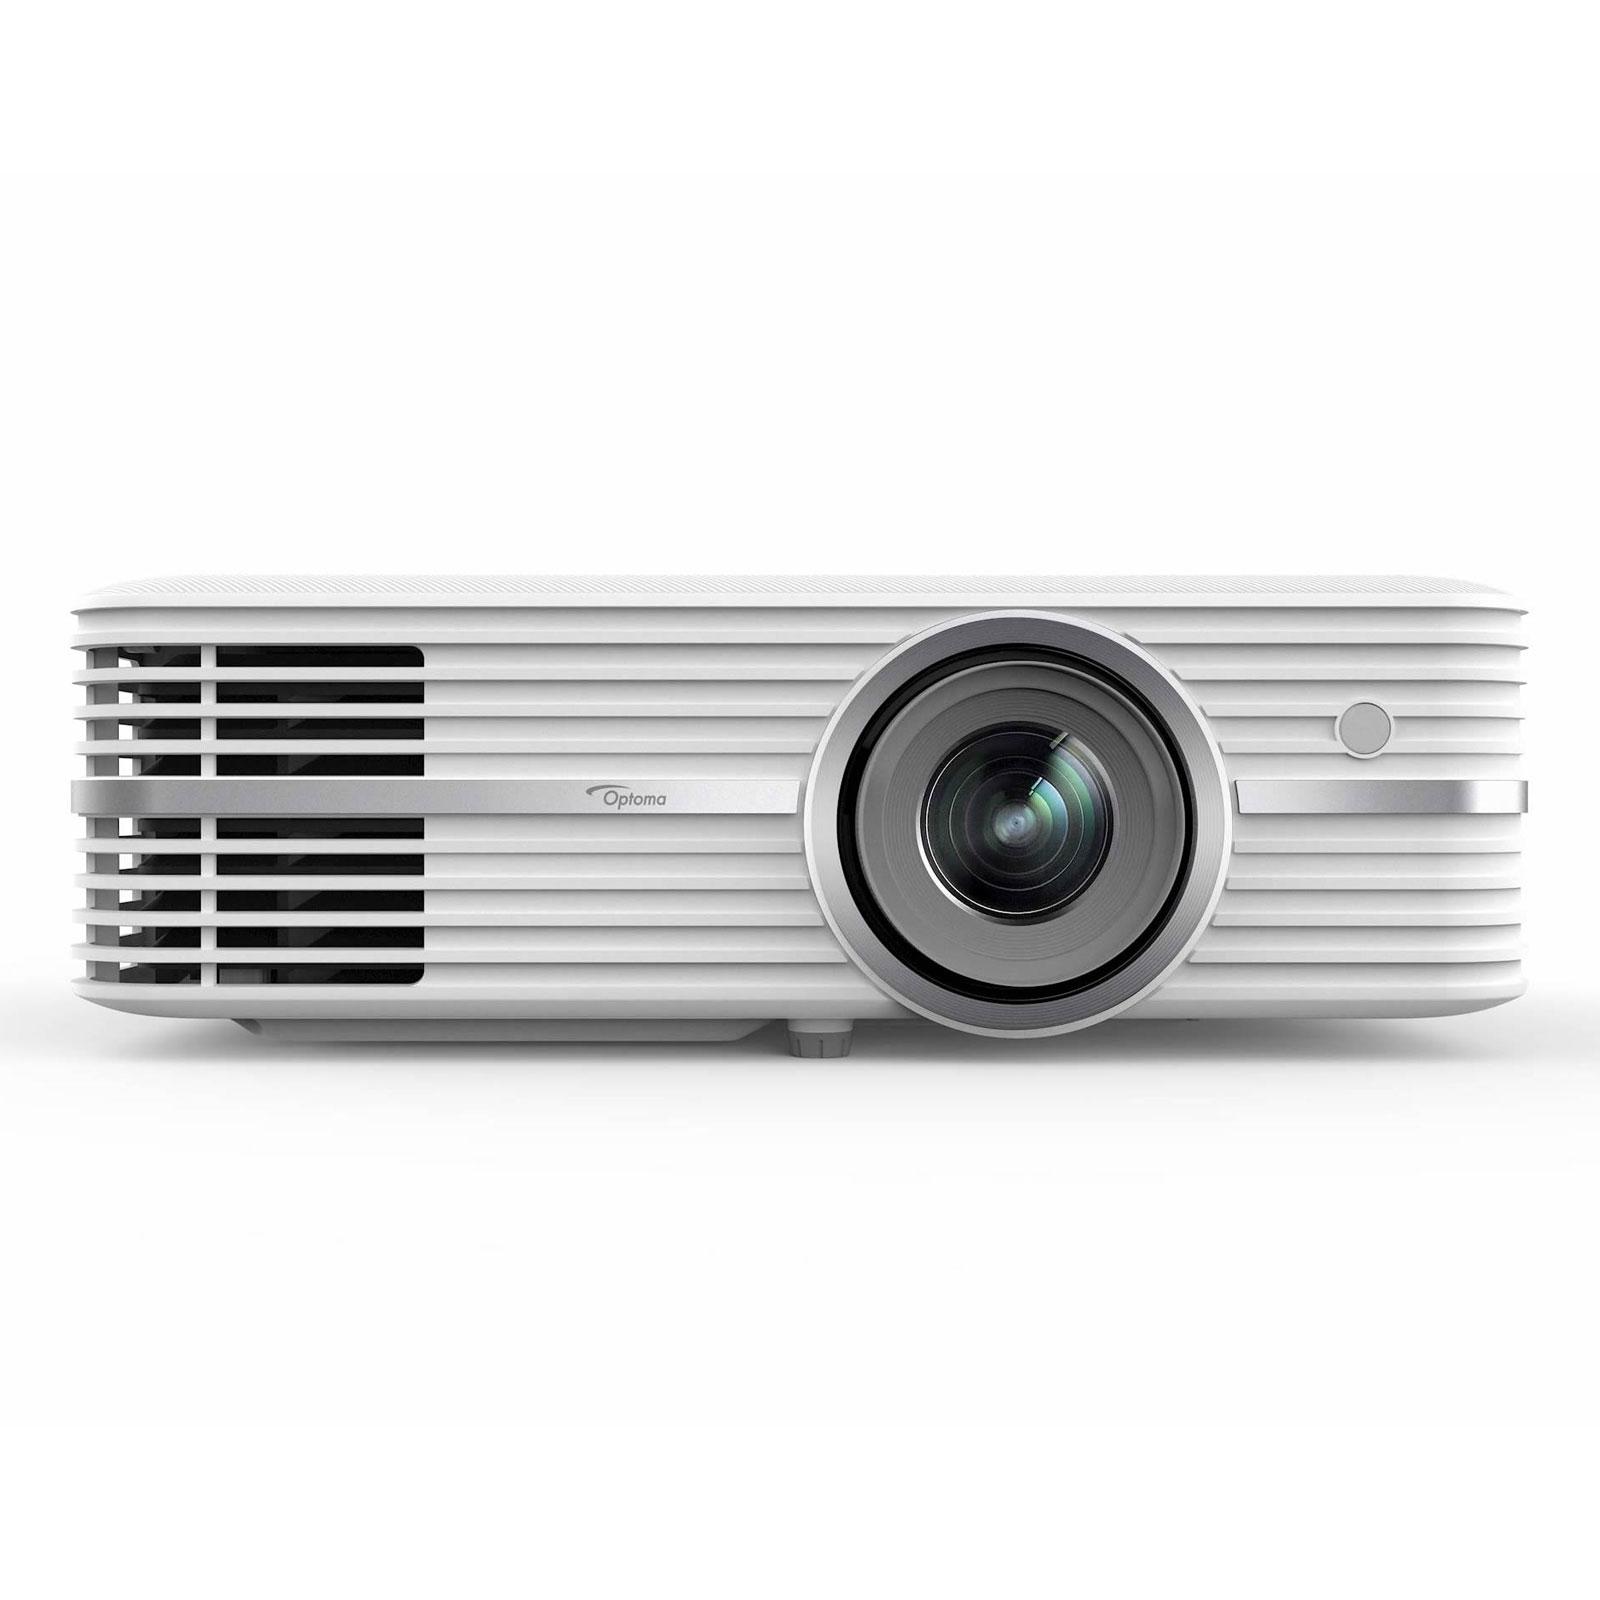 Vidéoprojecteur Optoma UHD300X Vidéoprojecteur 4K UHD - DLP - 2200 ANSI lumens - Compatibilité HDR - Lens Shift vertical - HDMI 2.0 - HDCP 2.2 - 2 x 5 Watts